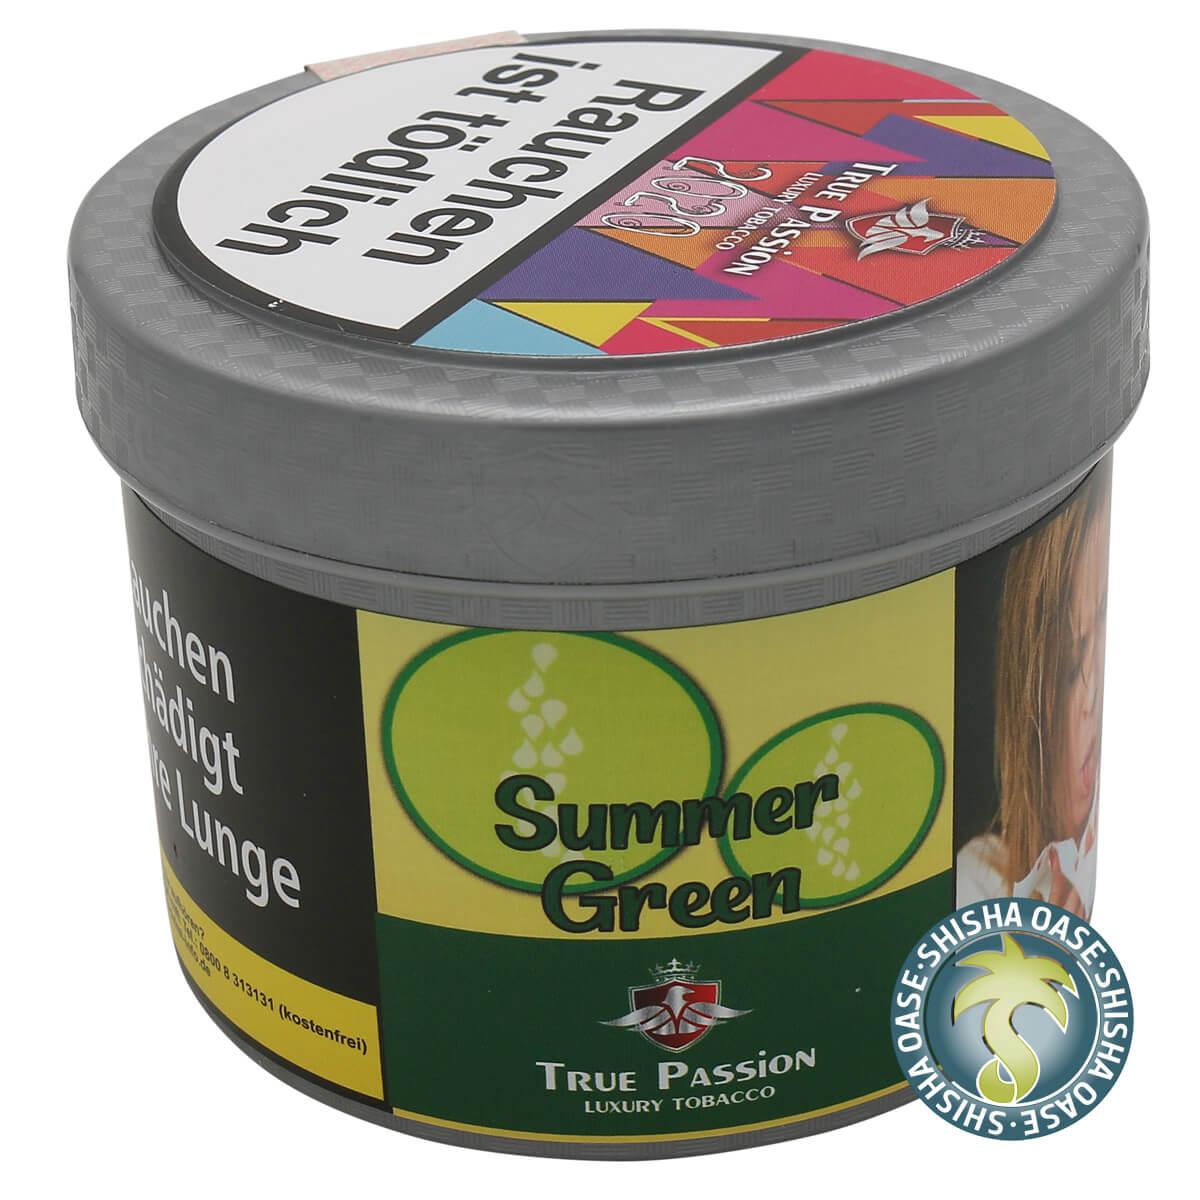 True Passion Tabak 200g Dose | Summer Green